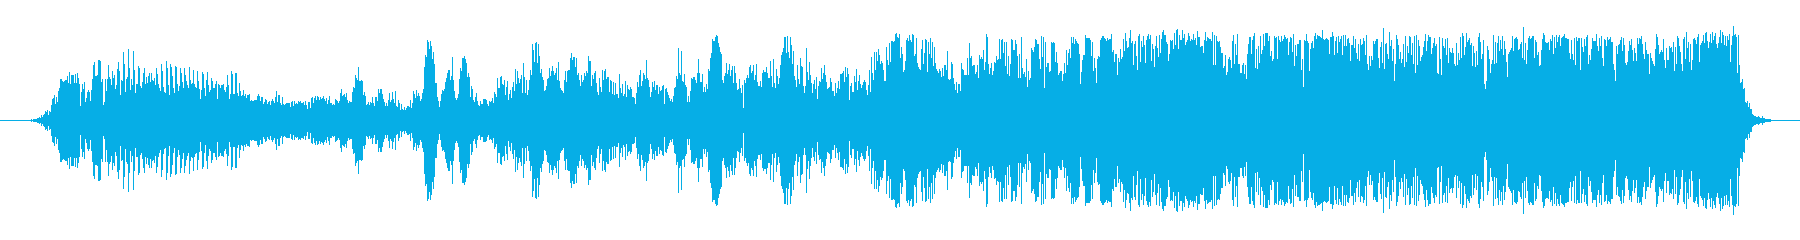 SWELL 位相揺れスウェル02の再生済みの波形